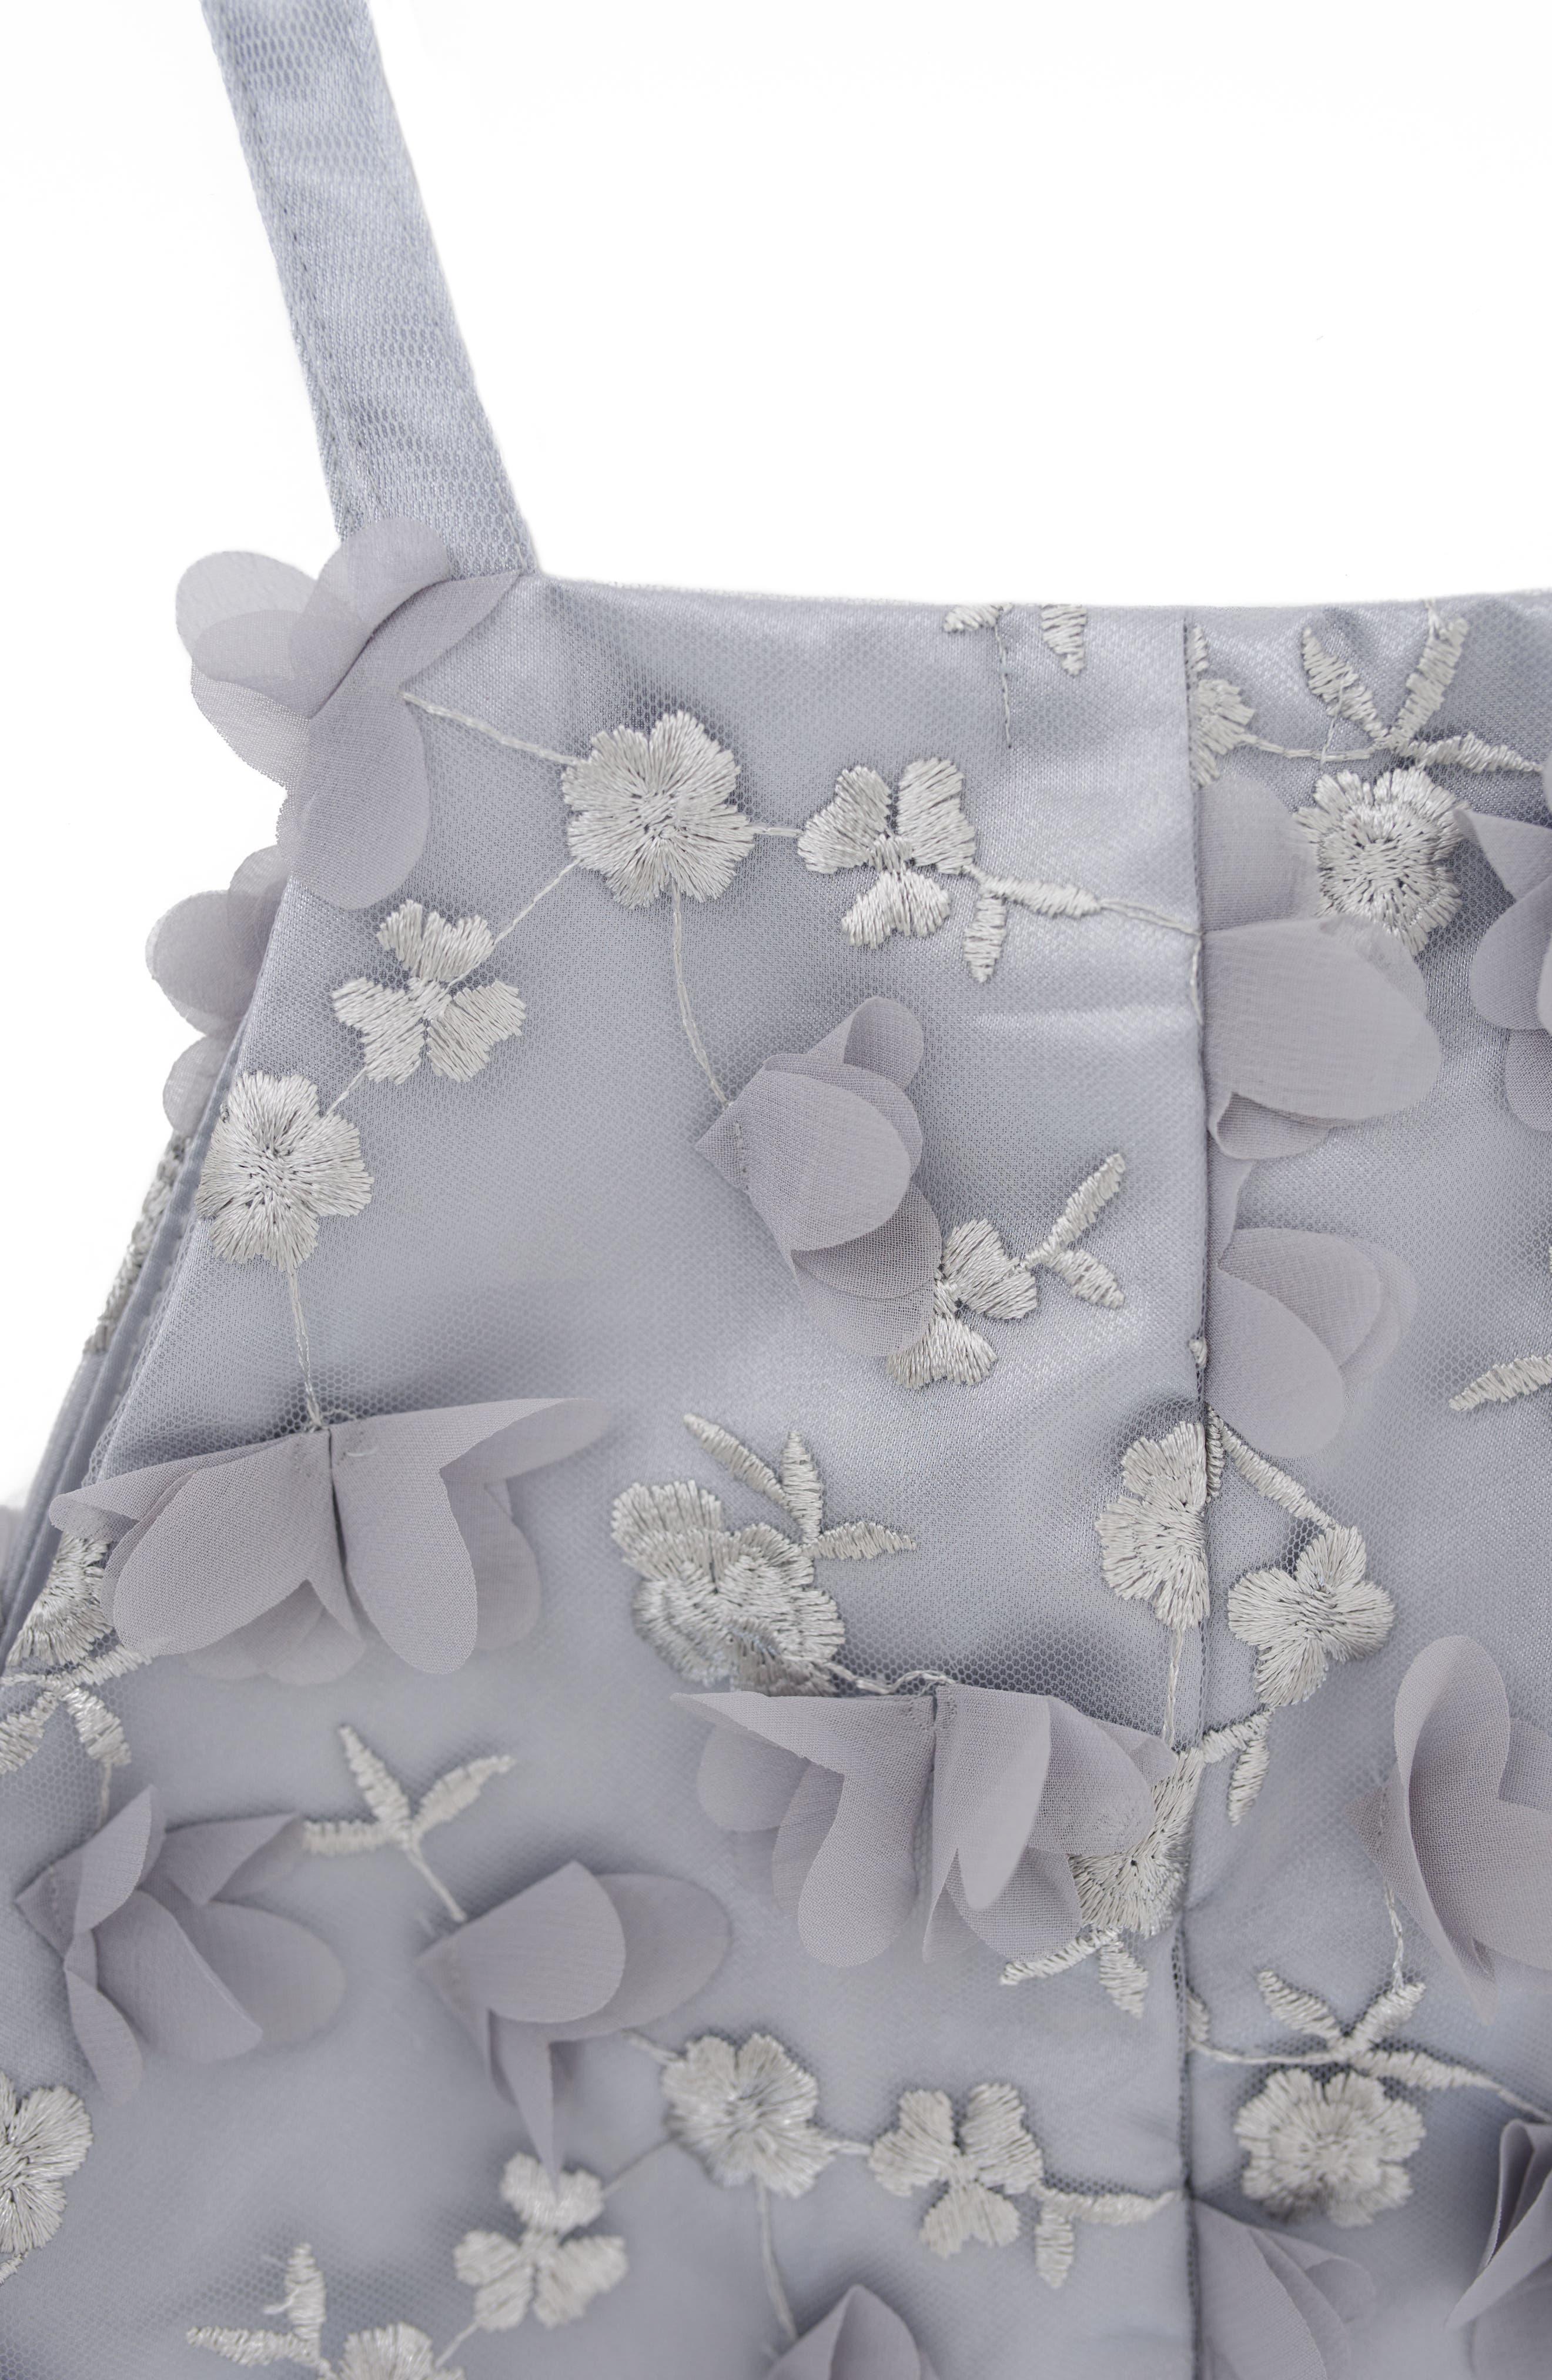 Stella M'Lia 3D Tulle Two-Piece Dress,                             Alternate thumbnail 3, color,                             Silver